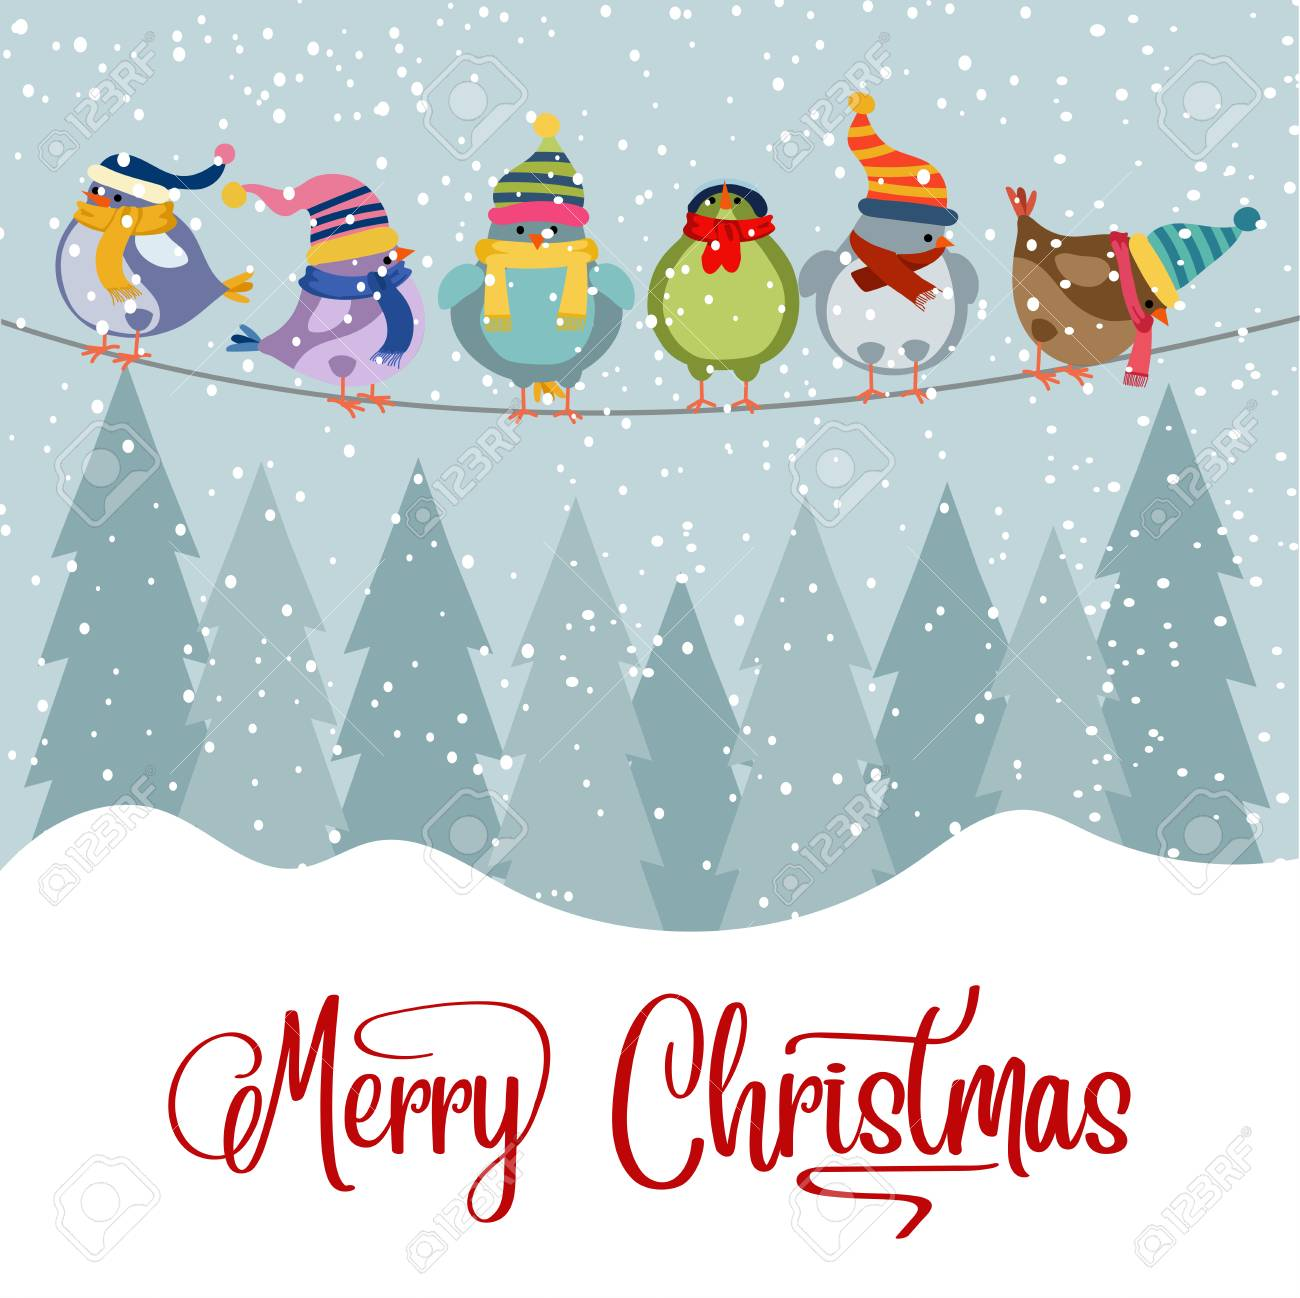 Christmas card with birds. Christmas background. Flat design. Vector - 127293605